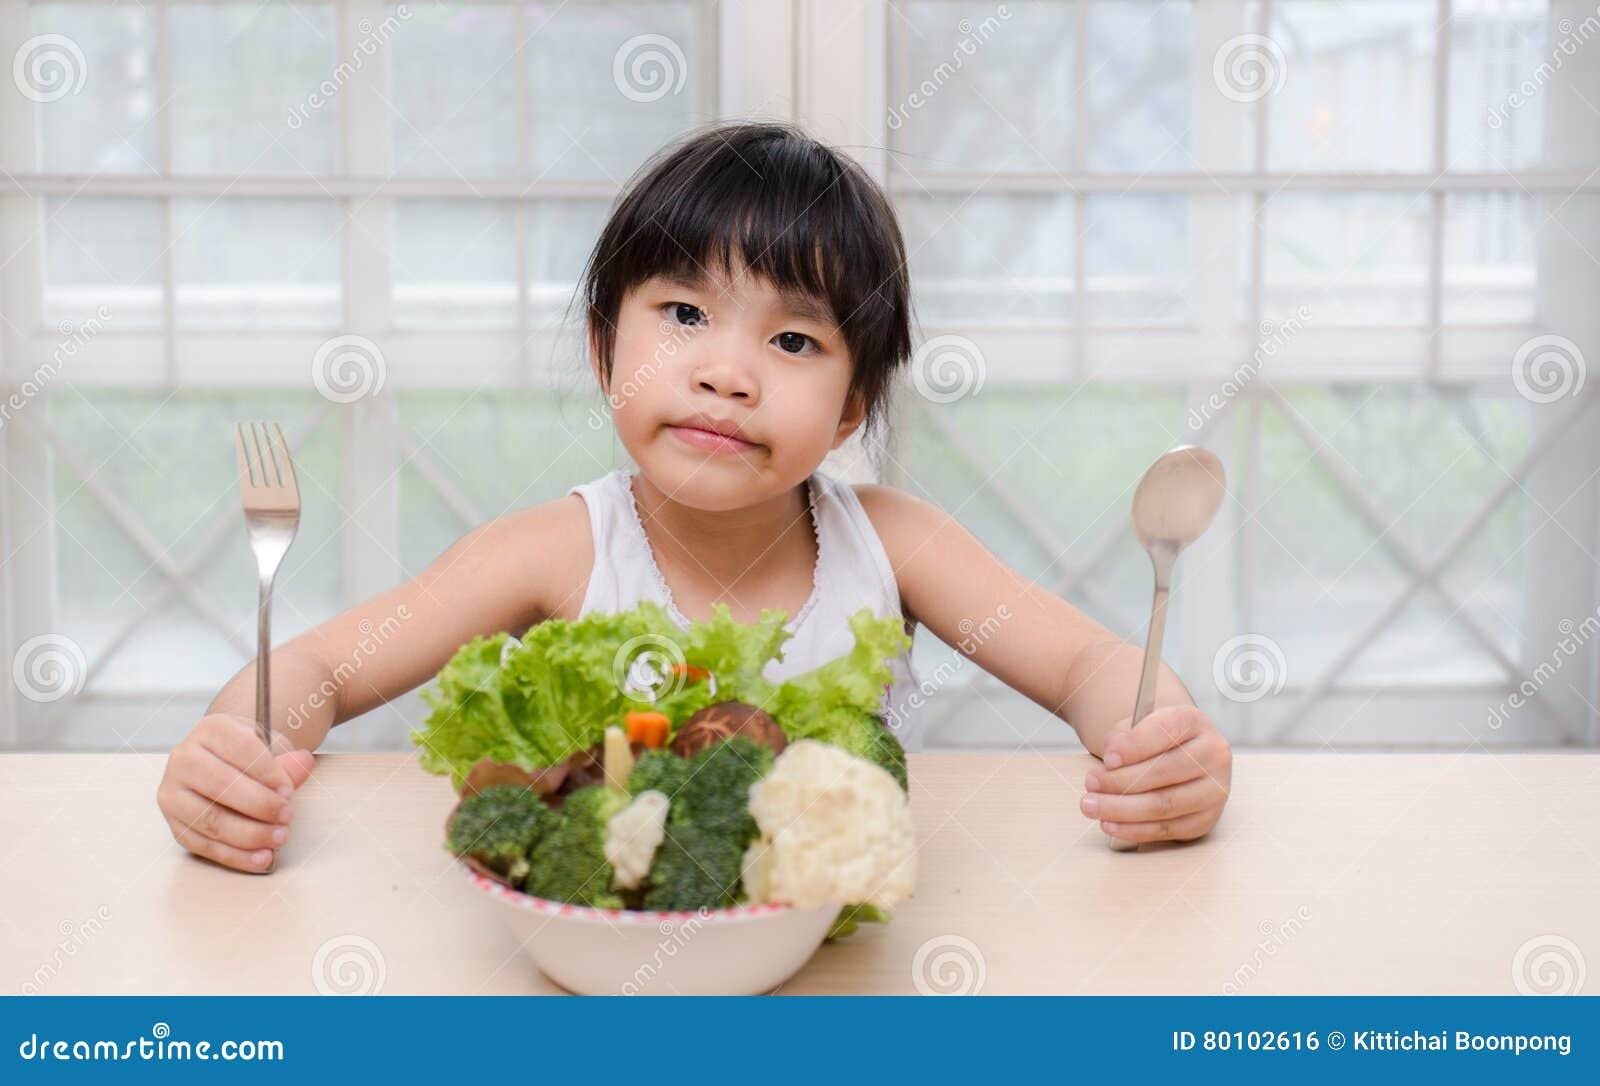 Weinig jong leuk zoet glimlachend meisje eet verse salade/gezond het eten concept